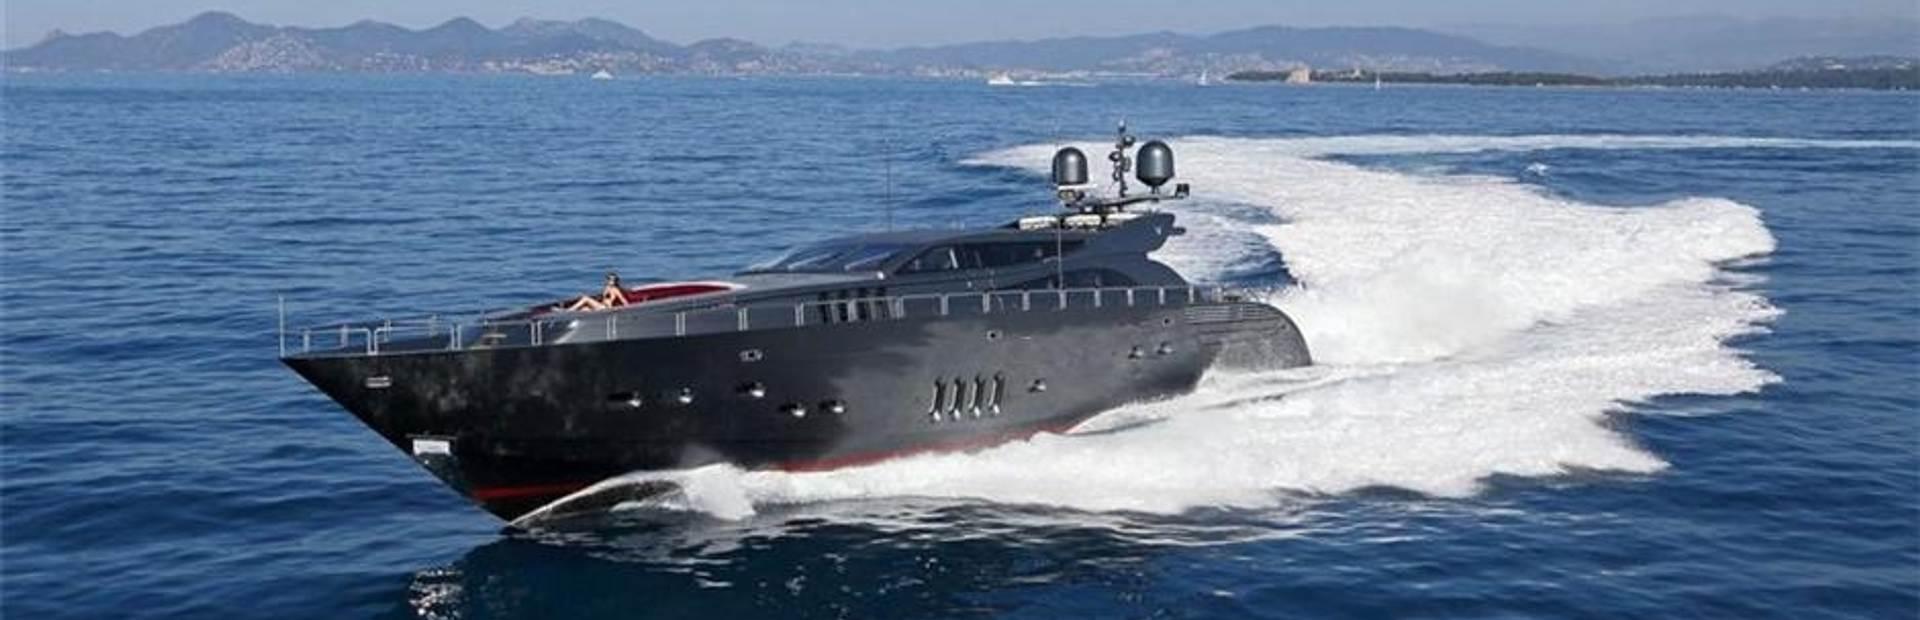 Leopard 34 Yacht Charter